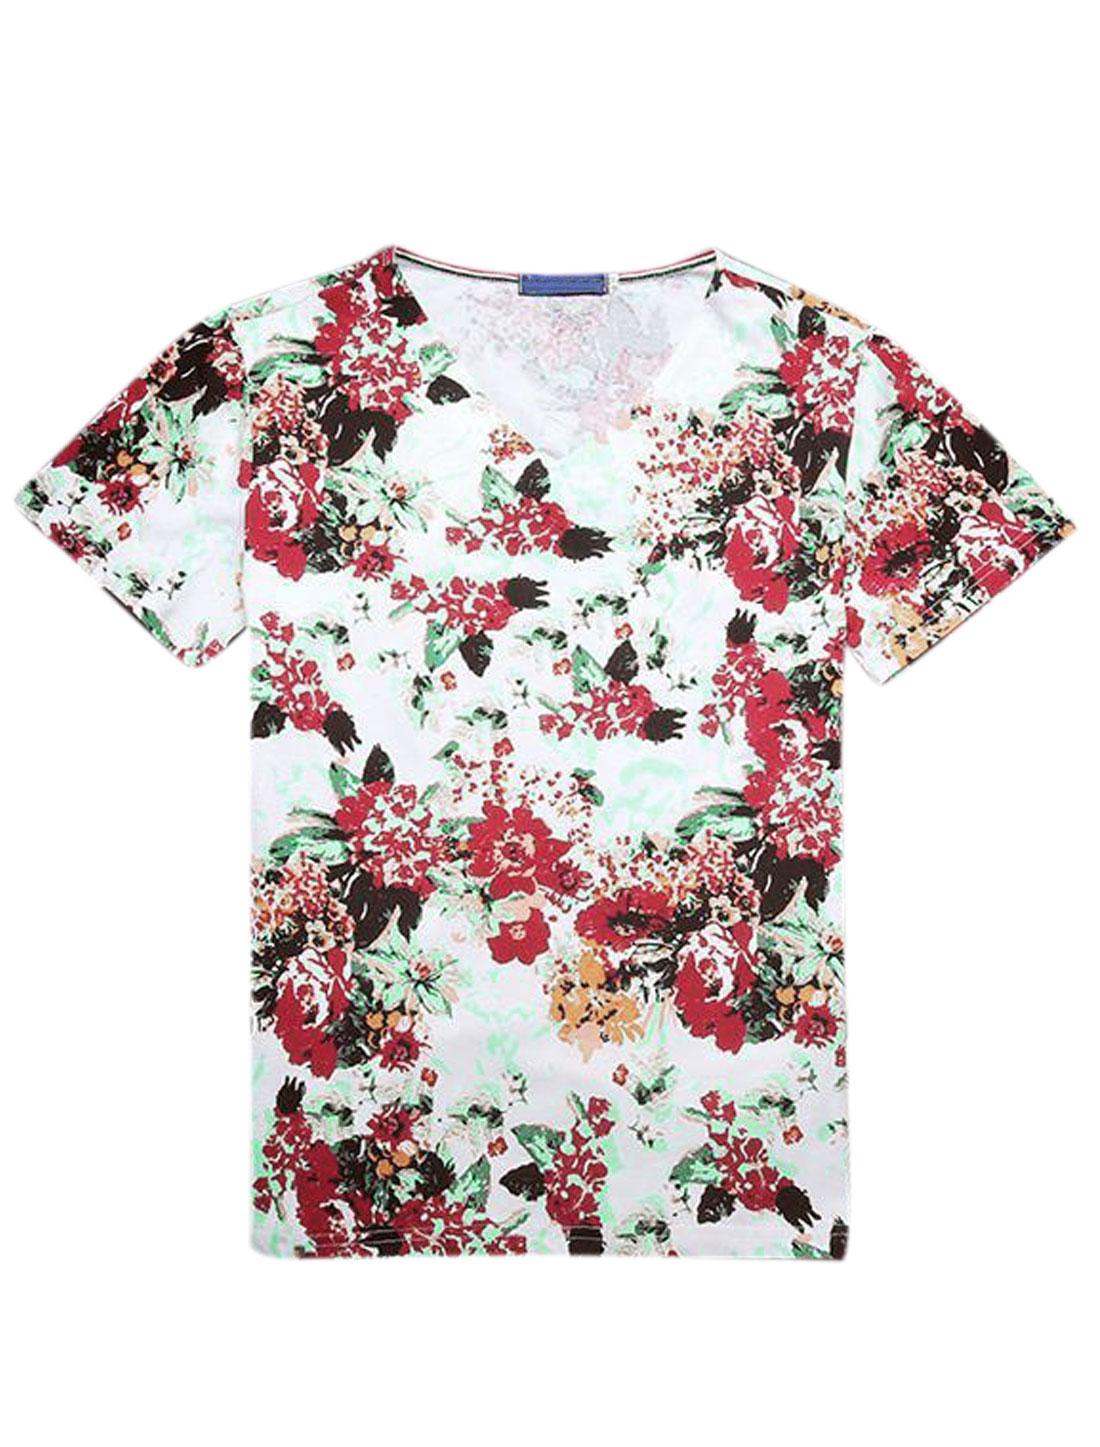 Men Short Sleeve V Neck Floral Print Casual Slim Fit T-Shirts White Burgundy S